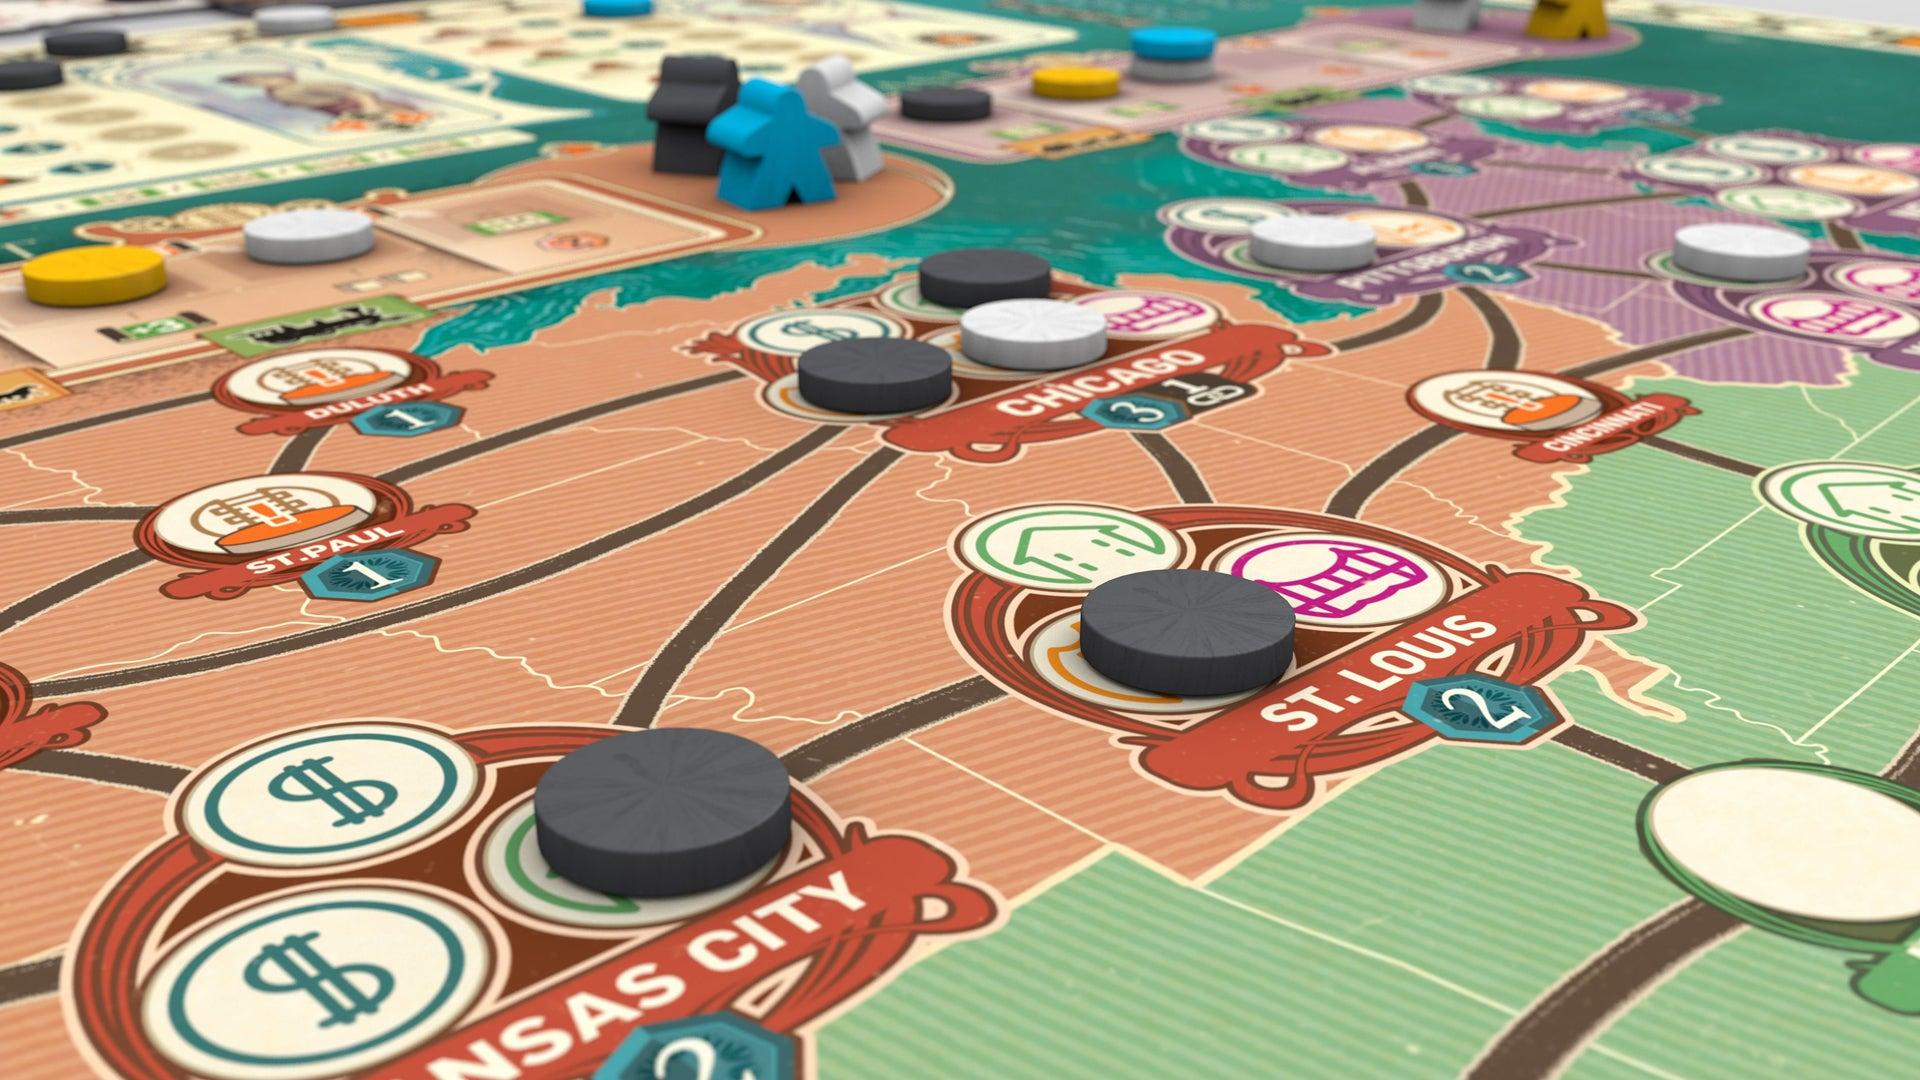 Carnegie board game layout